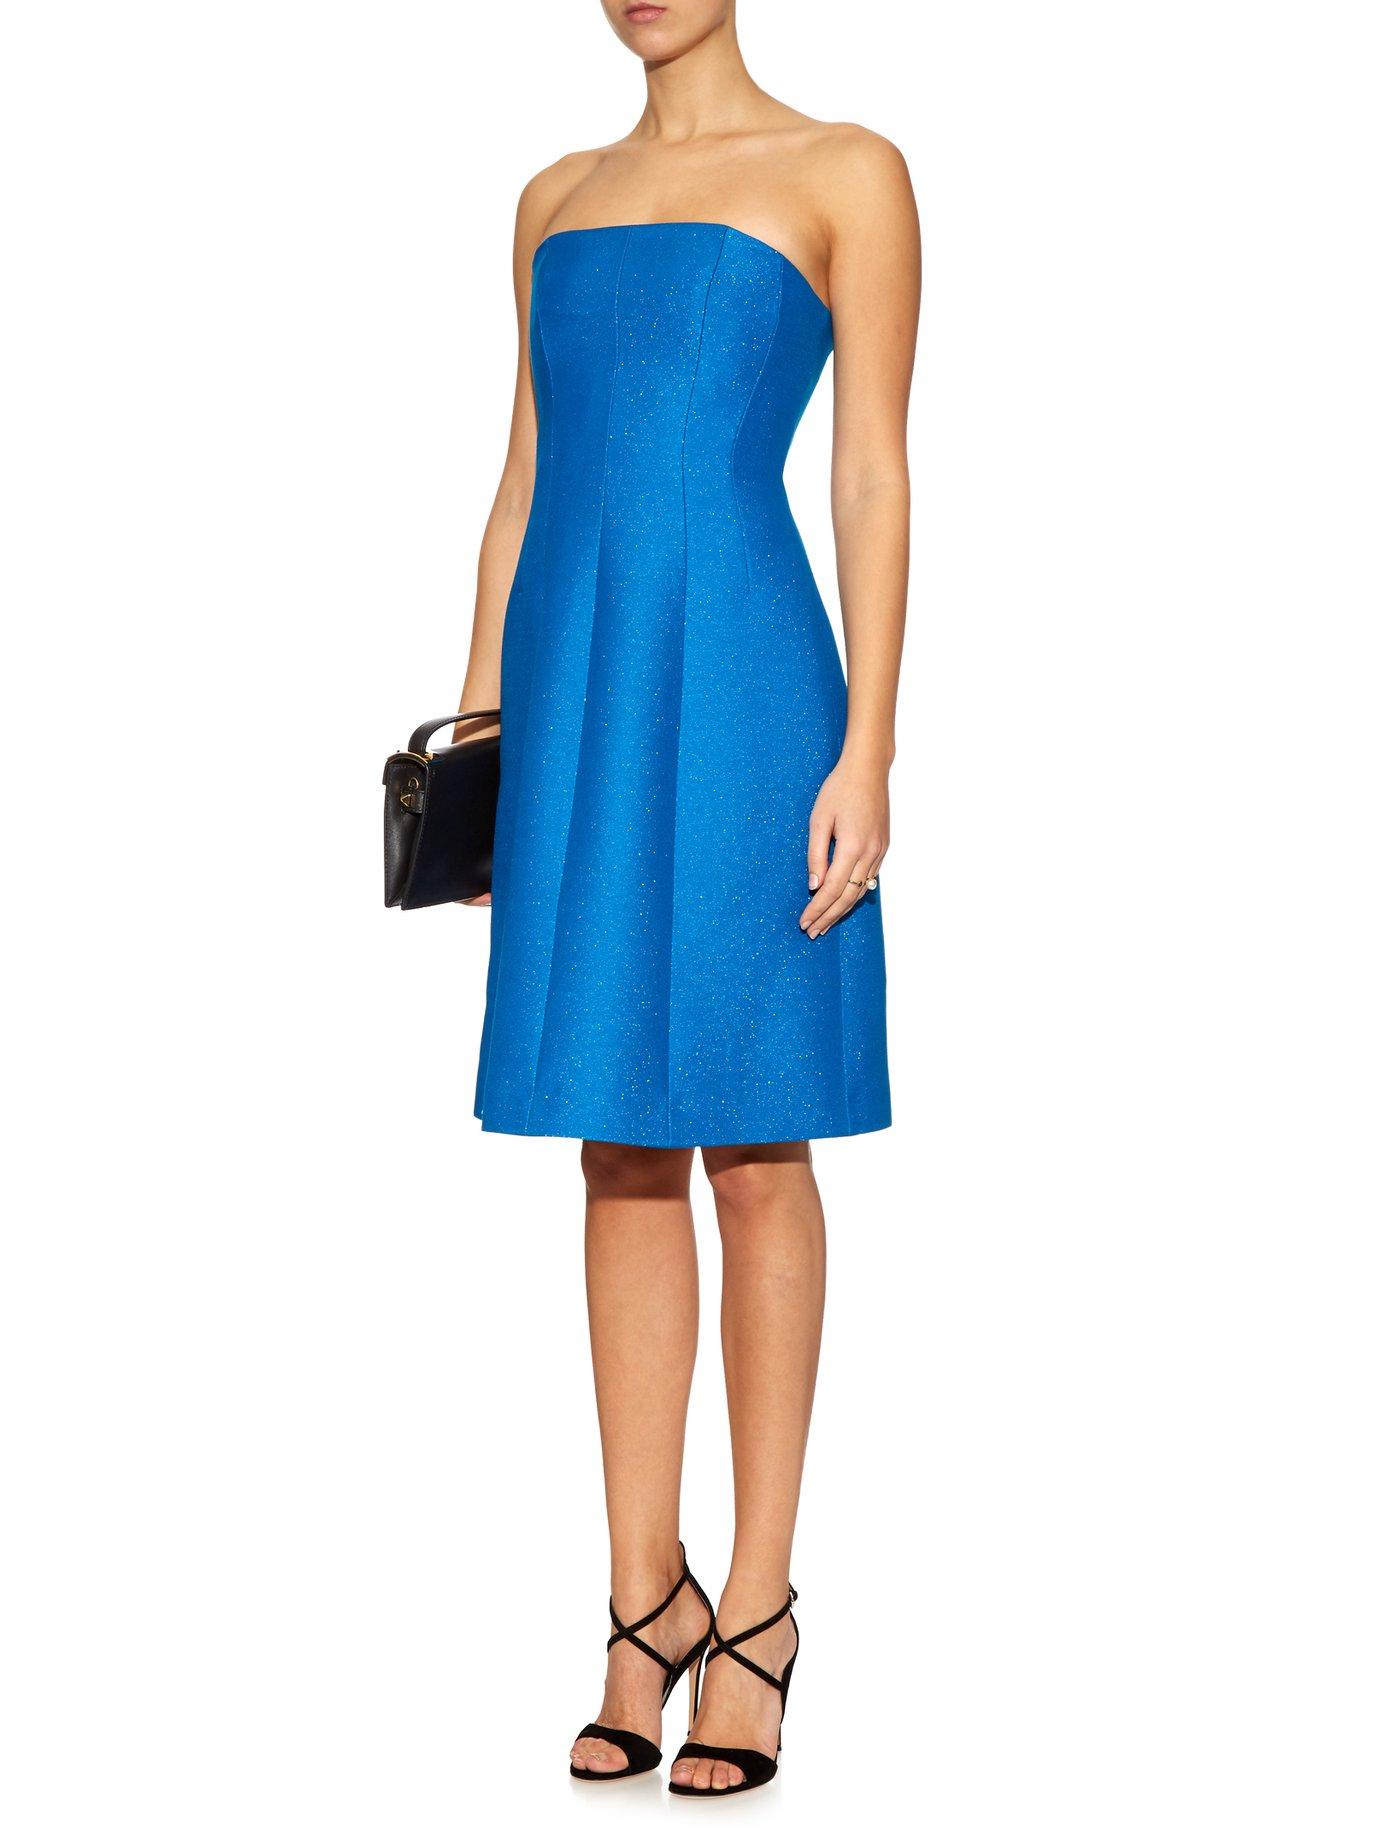 Derya strapless dress by Jonathan Saunders